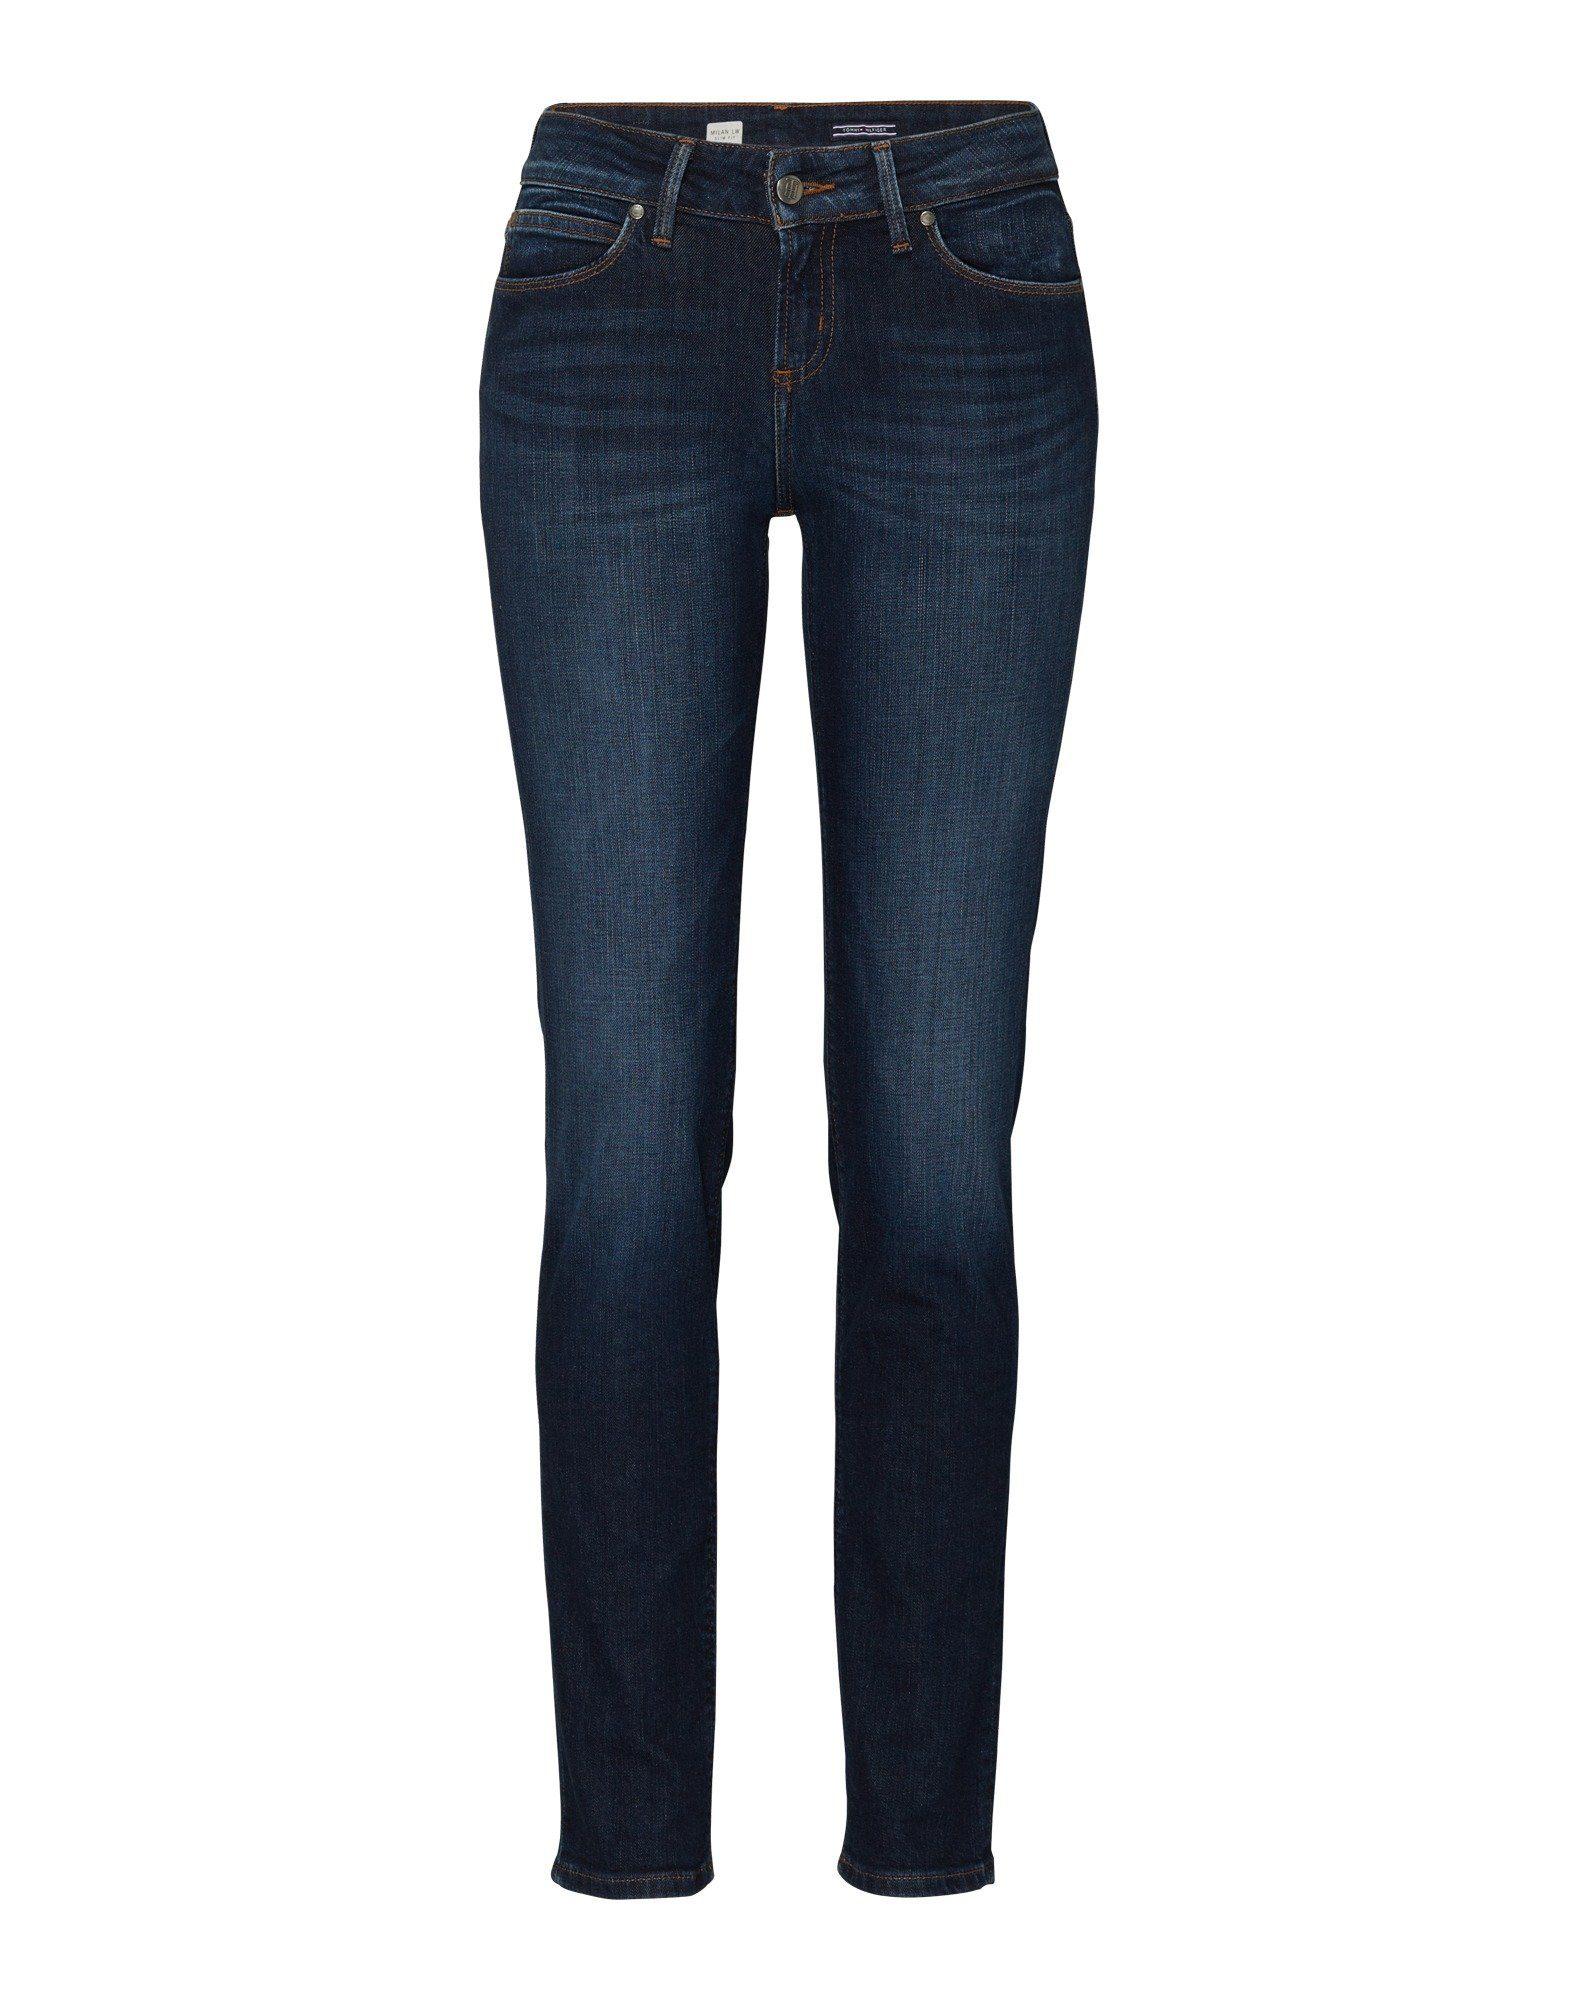 jeans milan tommy hilfiger